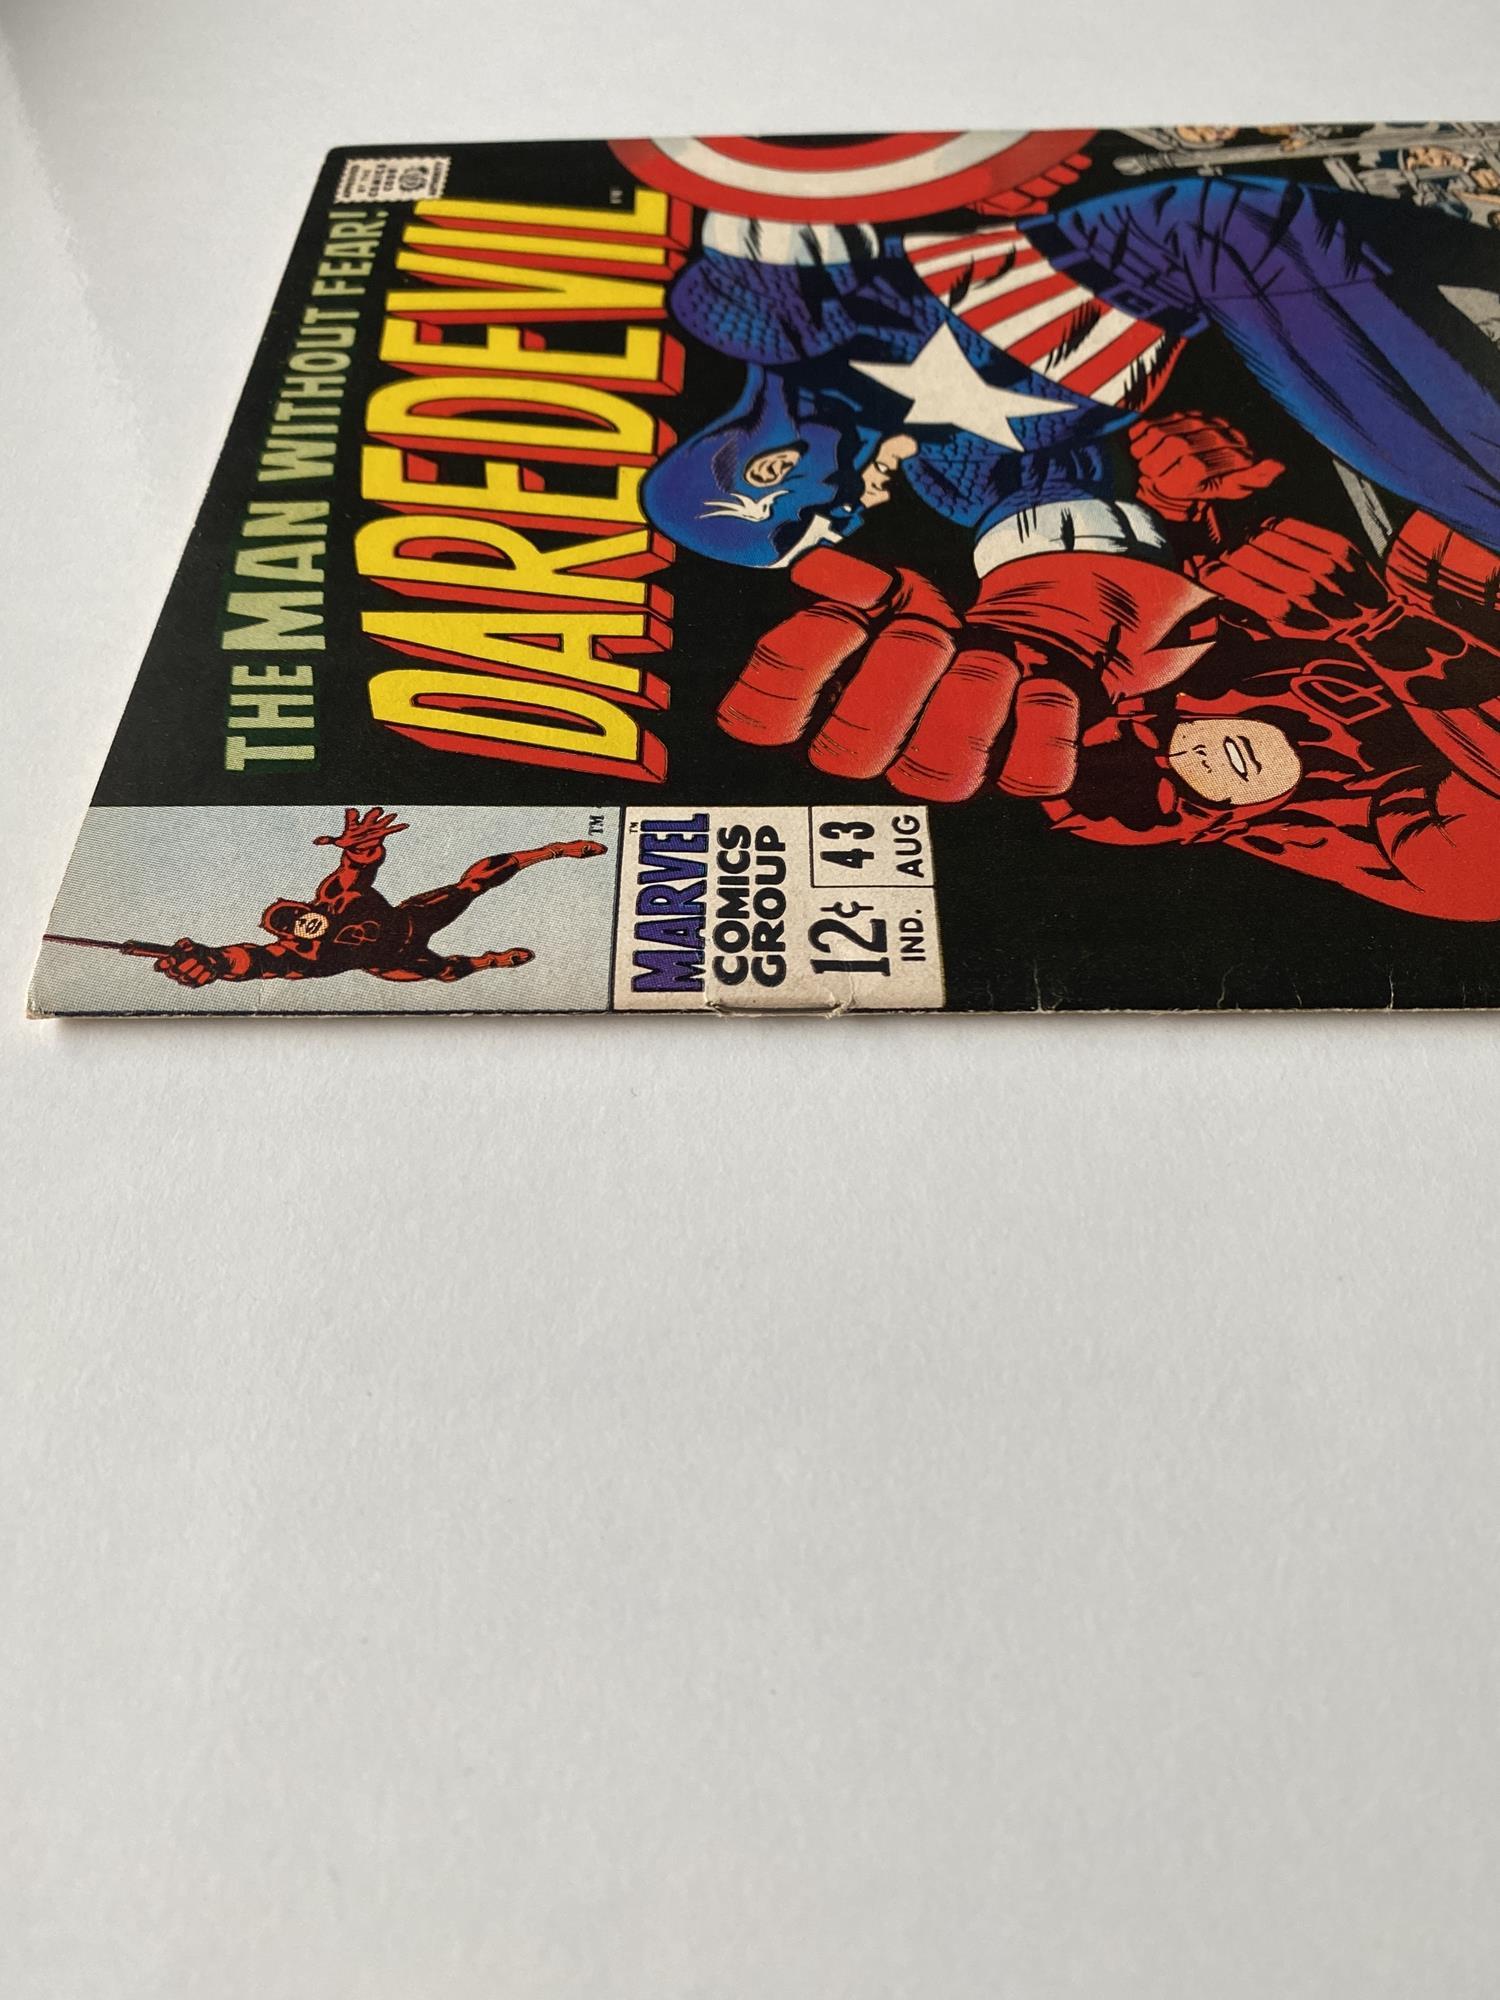 Lot 34 - DAREDEVIL # 43 (1968 - MARVEL - Cents Copy) - Classic Jack Kirby cover as Daredevil battles